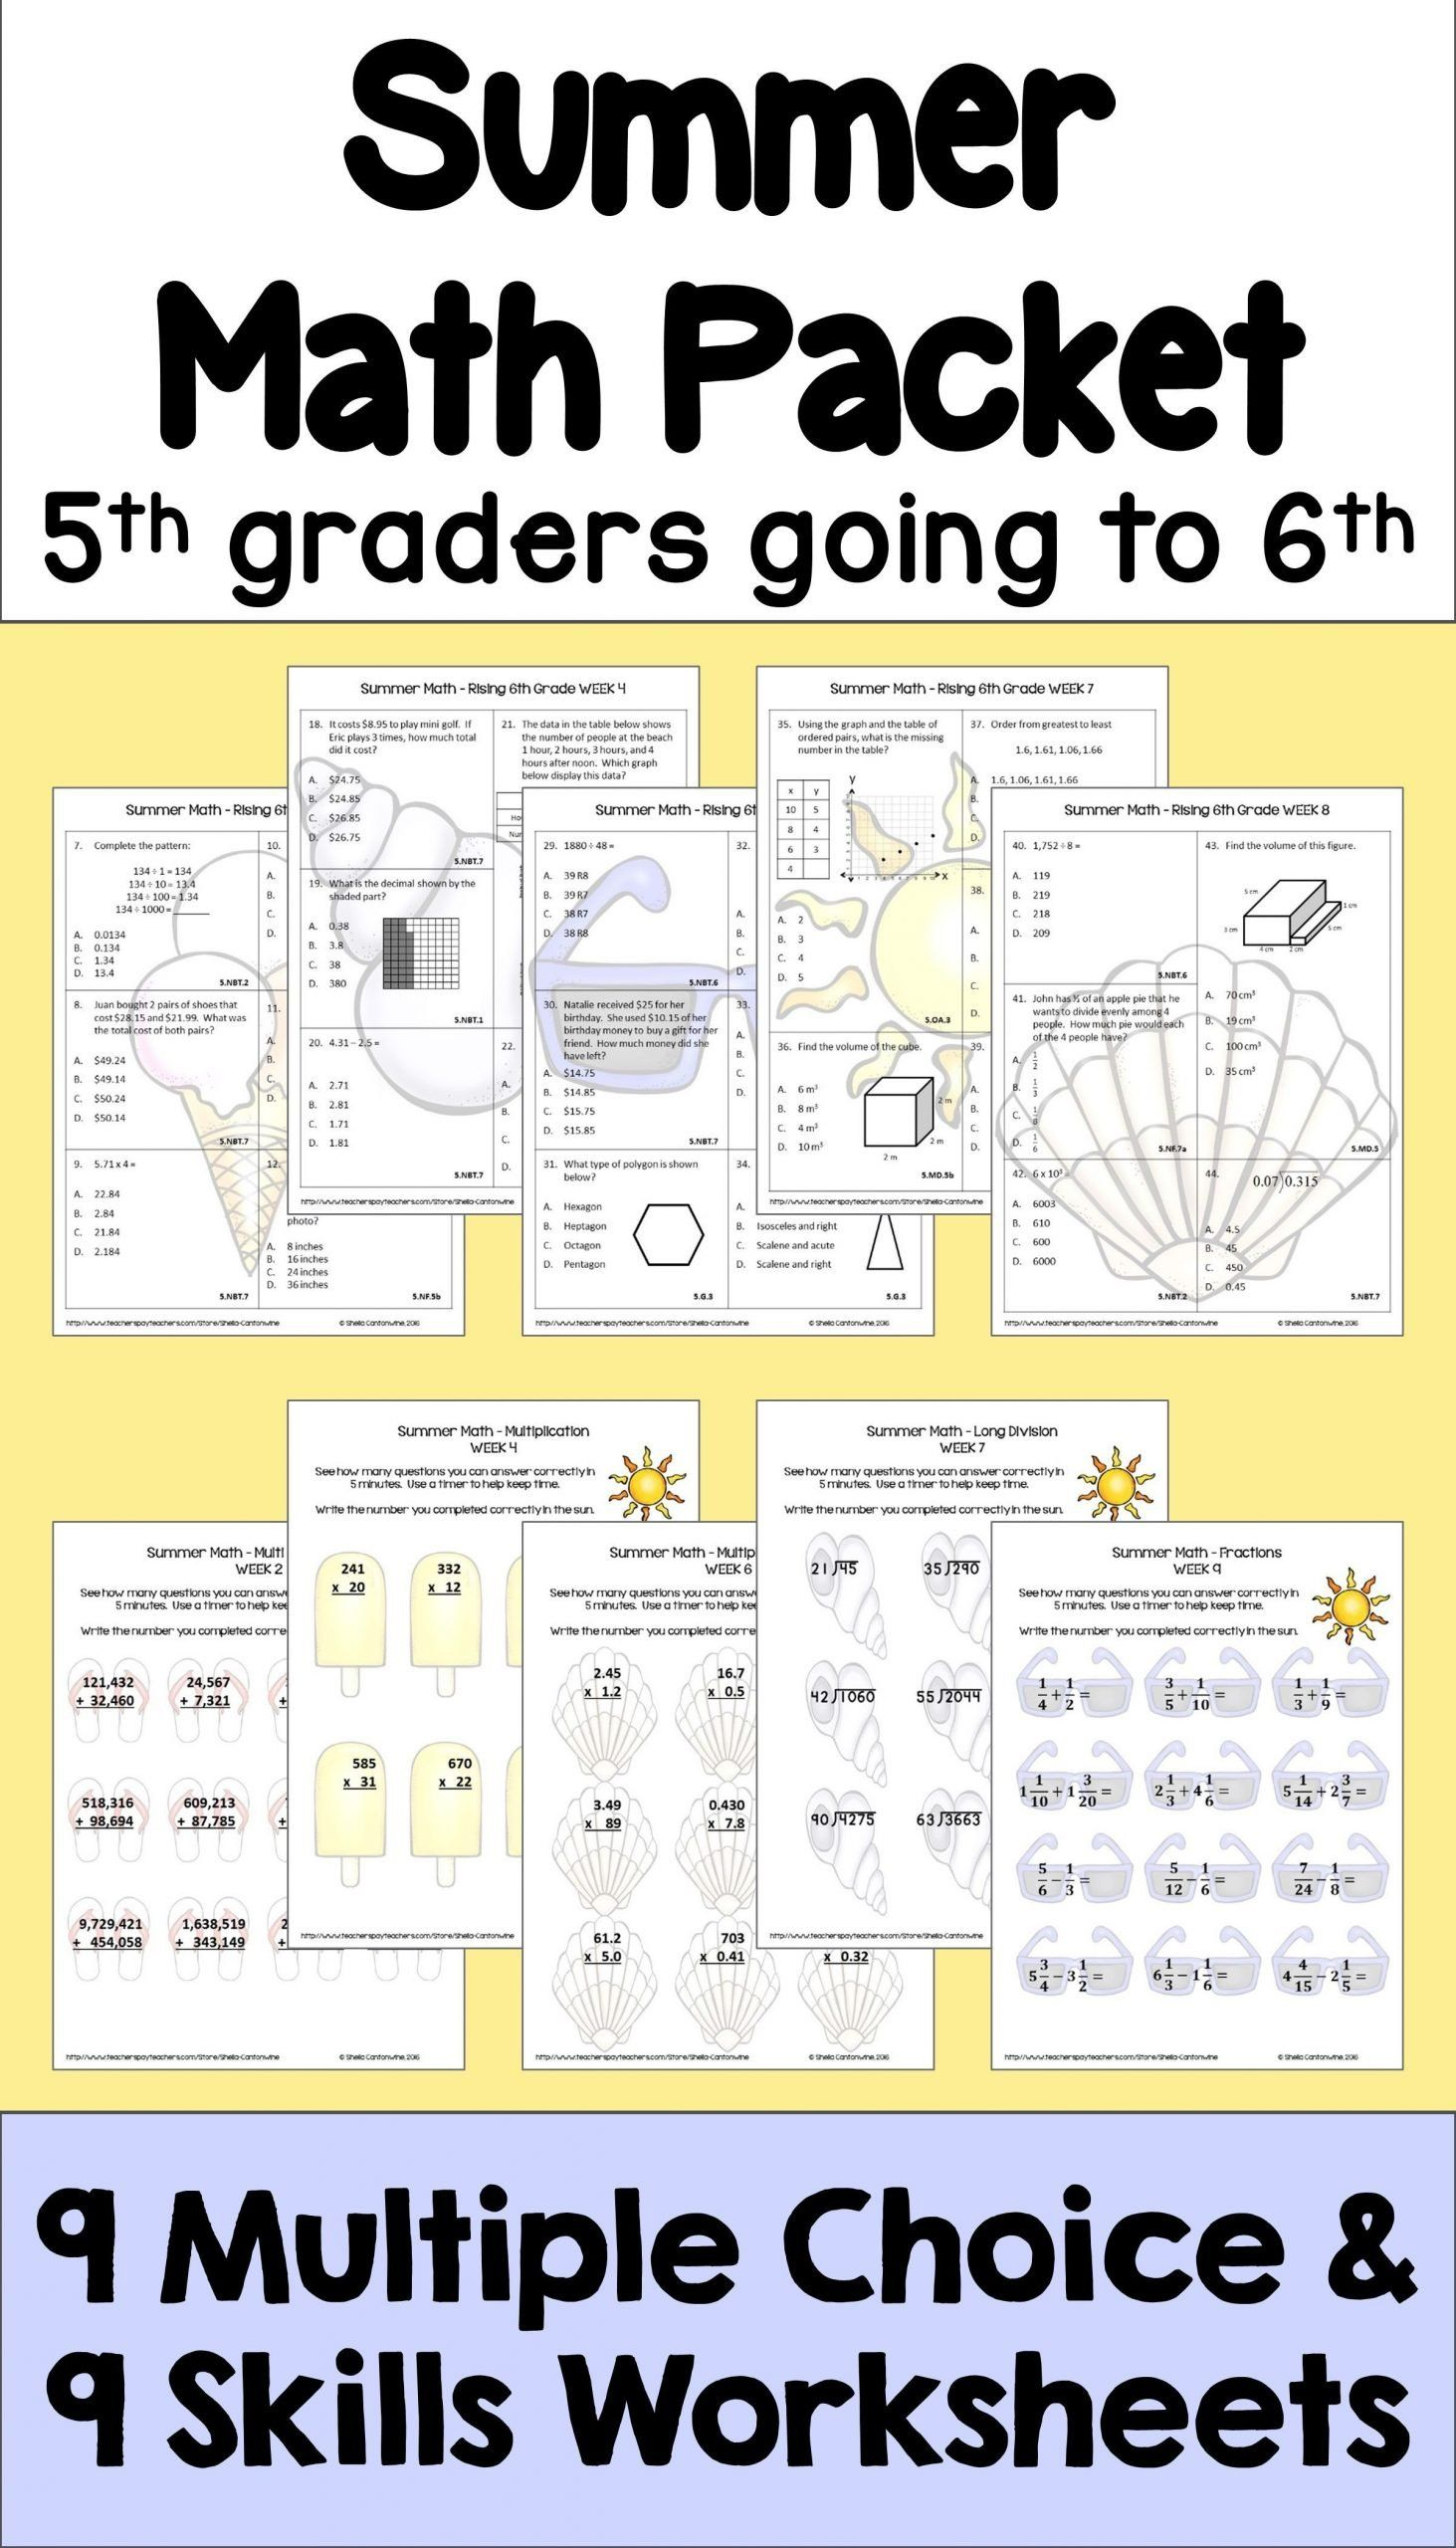 Abeka 5th Grade Math Worksheets Summer Math Packet For Rising 6th Graders Review Of 5th Summer Math Summer Math Packet Math Packets [ 2560 x 1463 Pixel ]